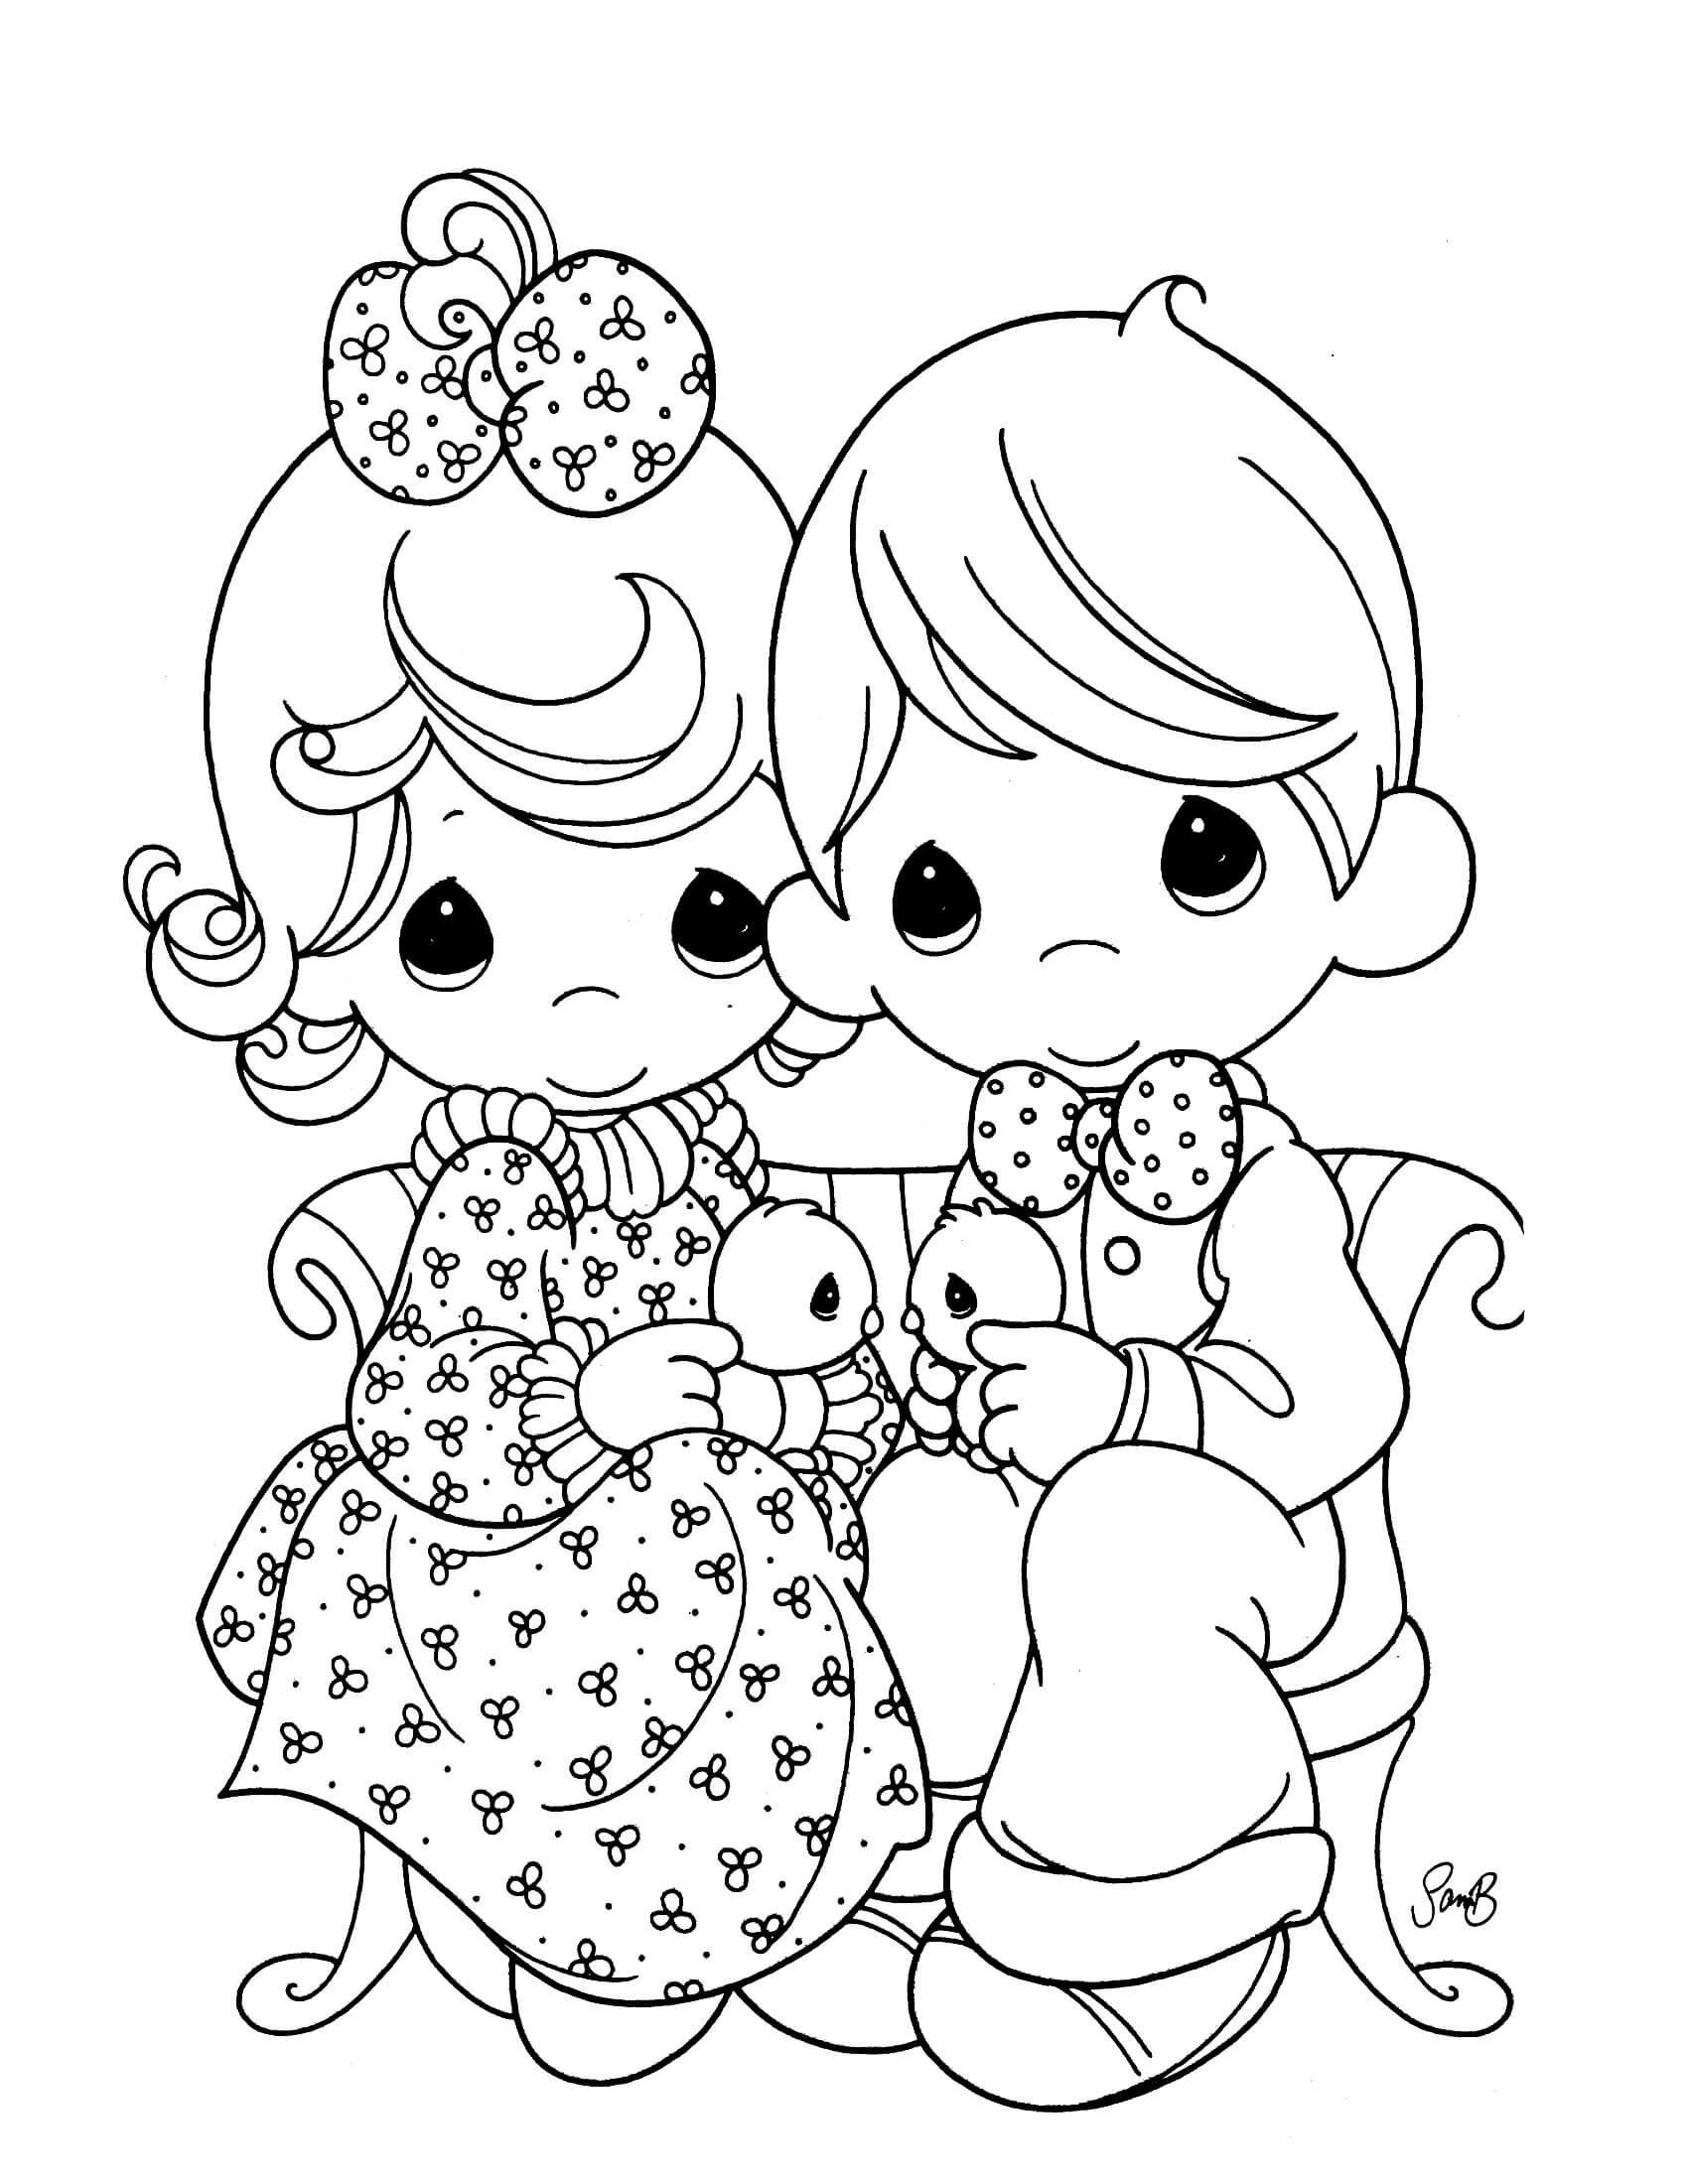 precious moments coloring page | Color | Pinterest | Precious ...